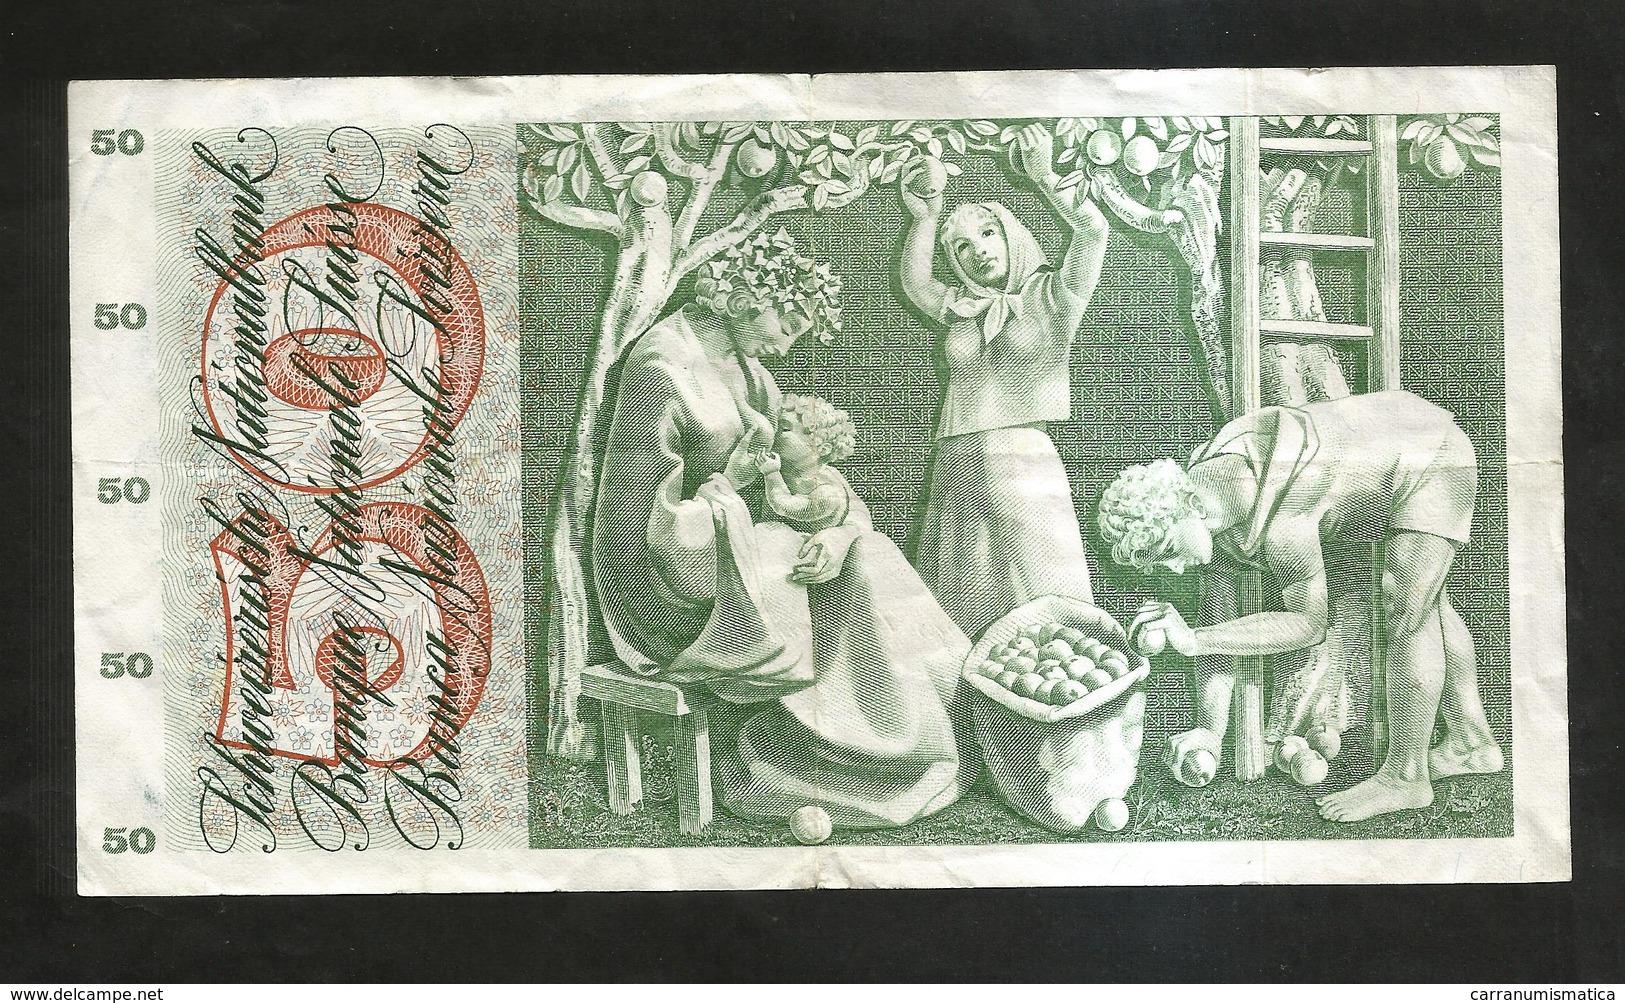 SVIZZERA / SUISSE / SWITZERLAND - NATIONAL BANK - 50 FRANCS / FRANKEN (1973) APFELERNTE - Svizzera